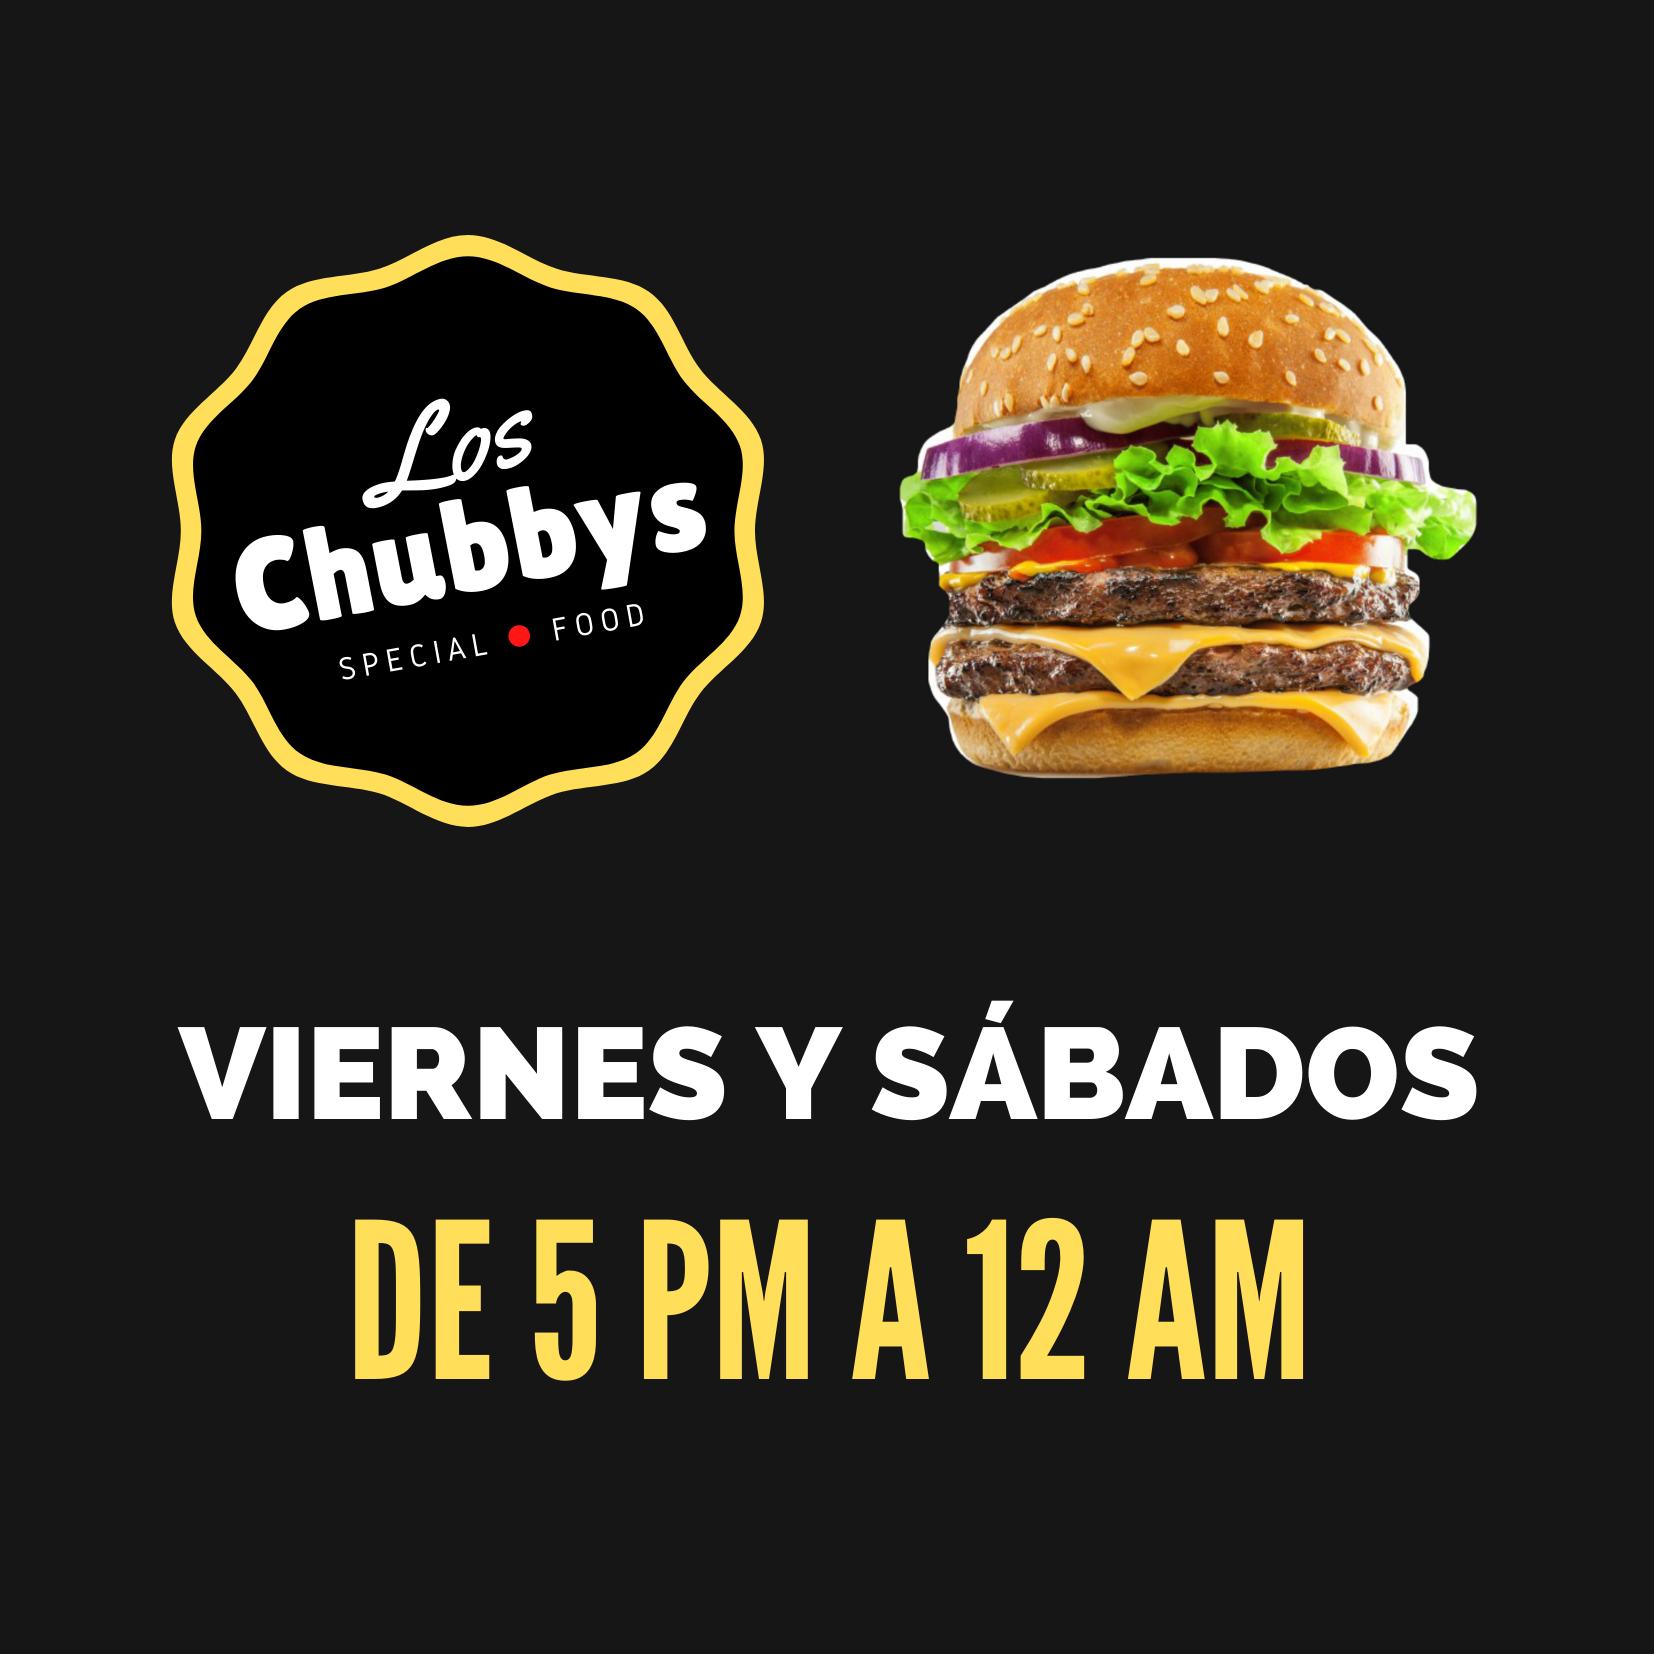 LOS CHUBBYS